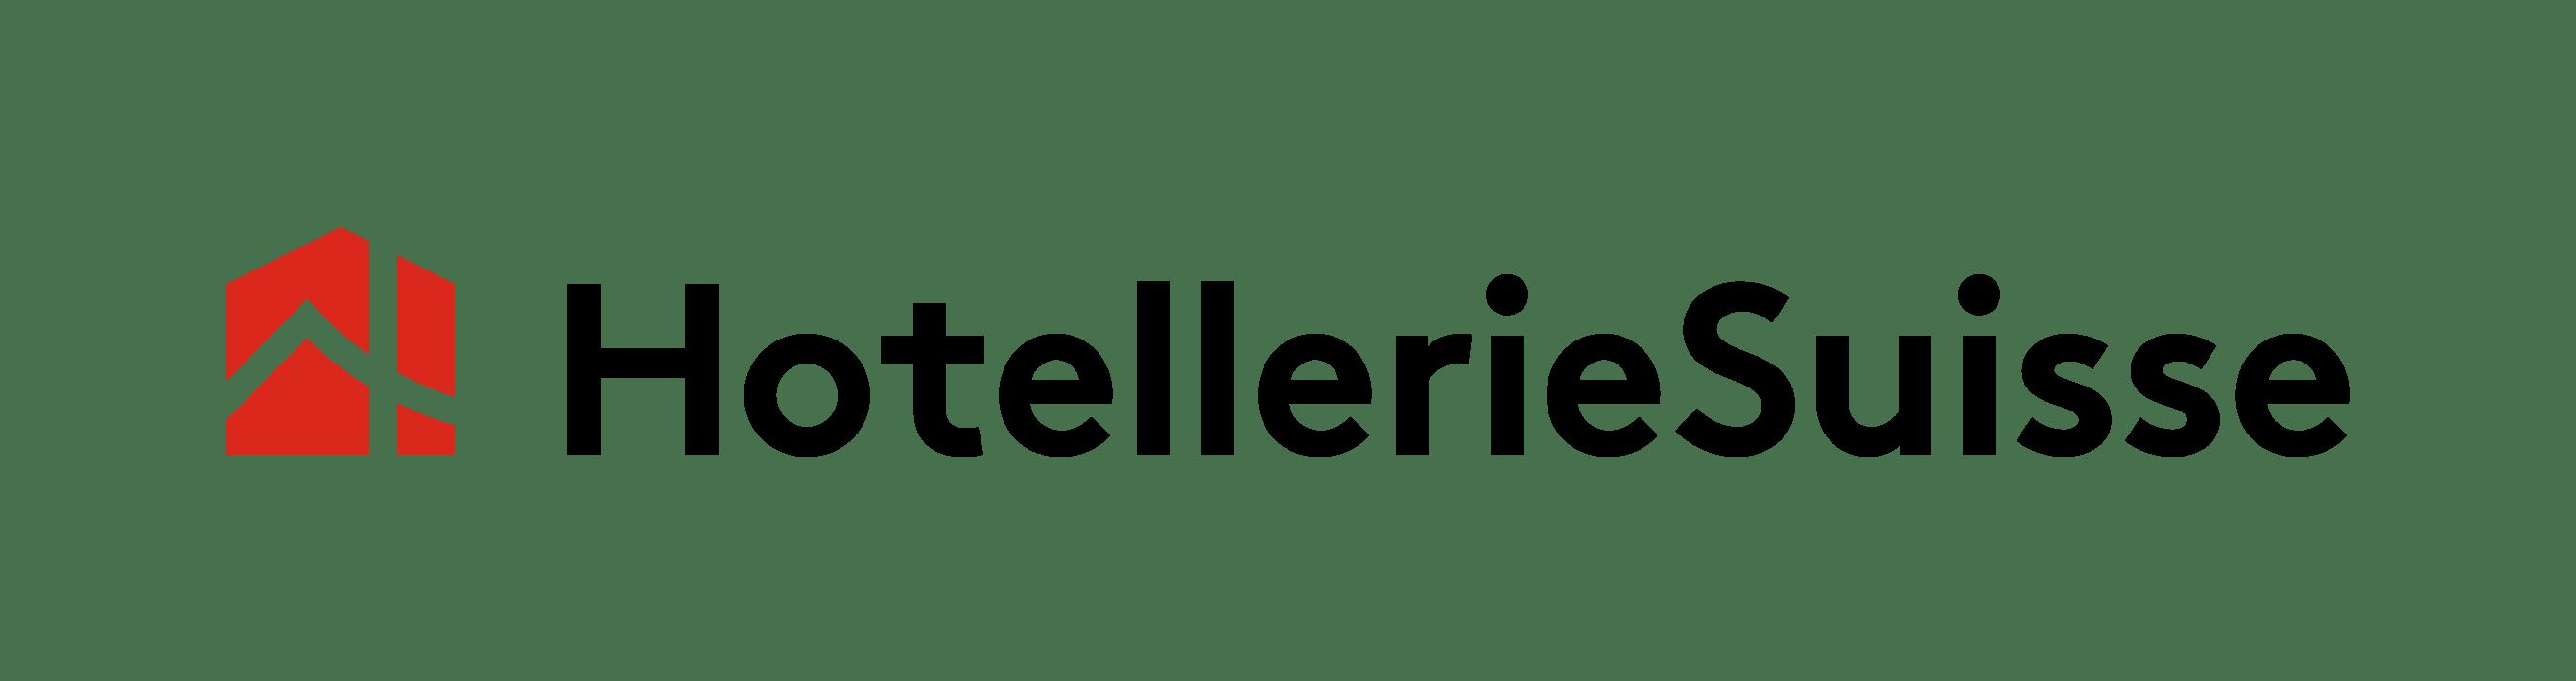 20200122-company-factory-zuerich-winterthur-2020-logo-hotellerie-suisse